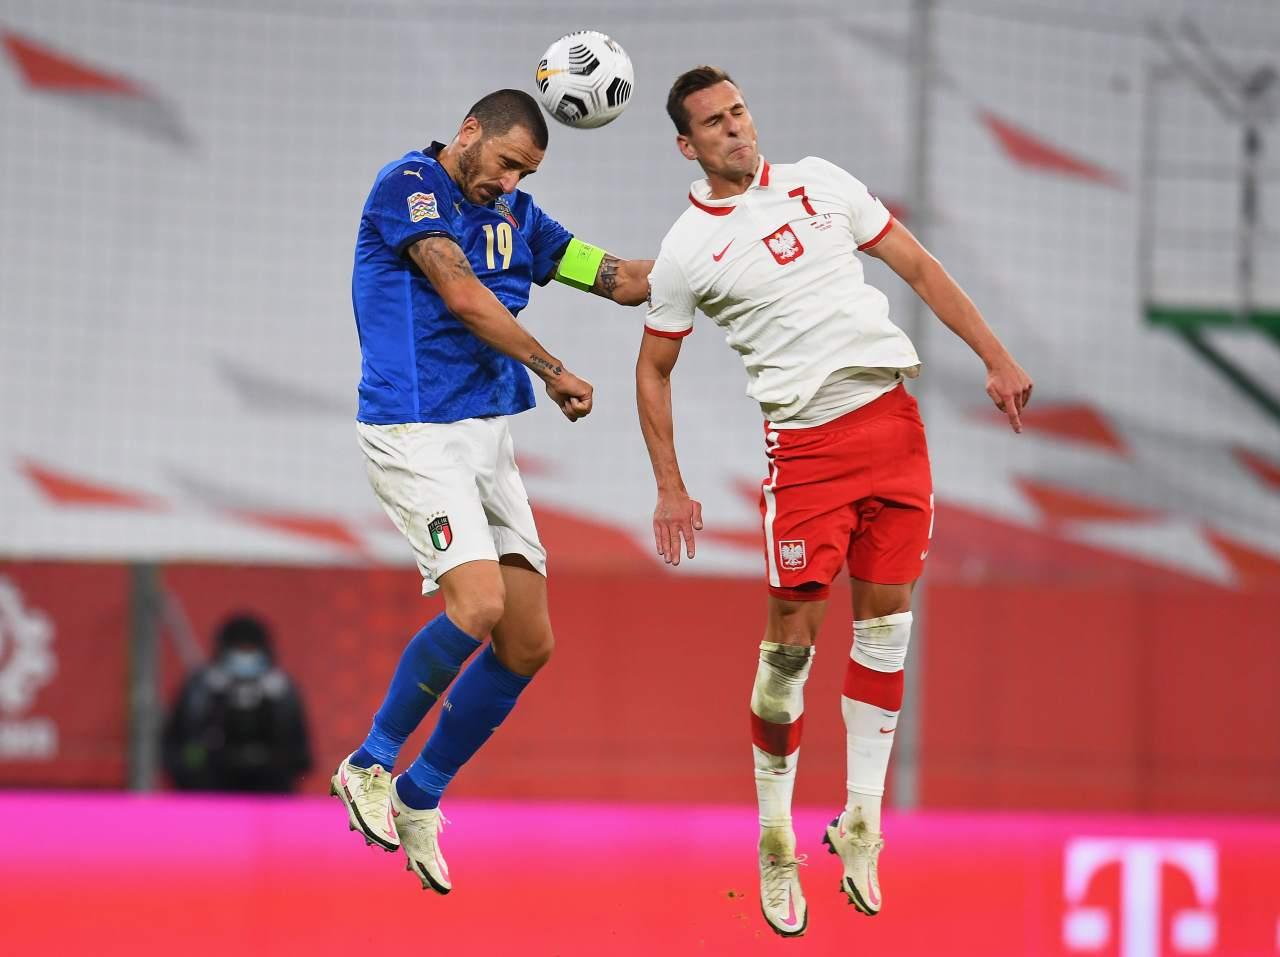 Calciomercato Juventus, tris di club su Milik | La situazione